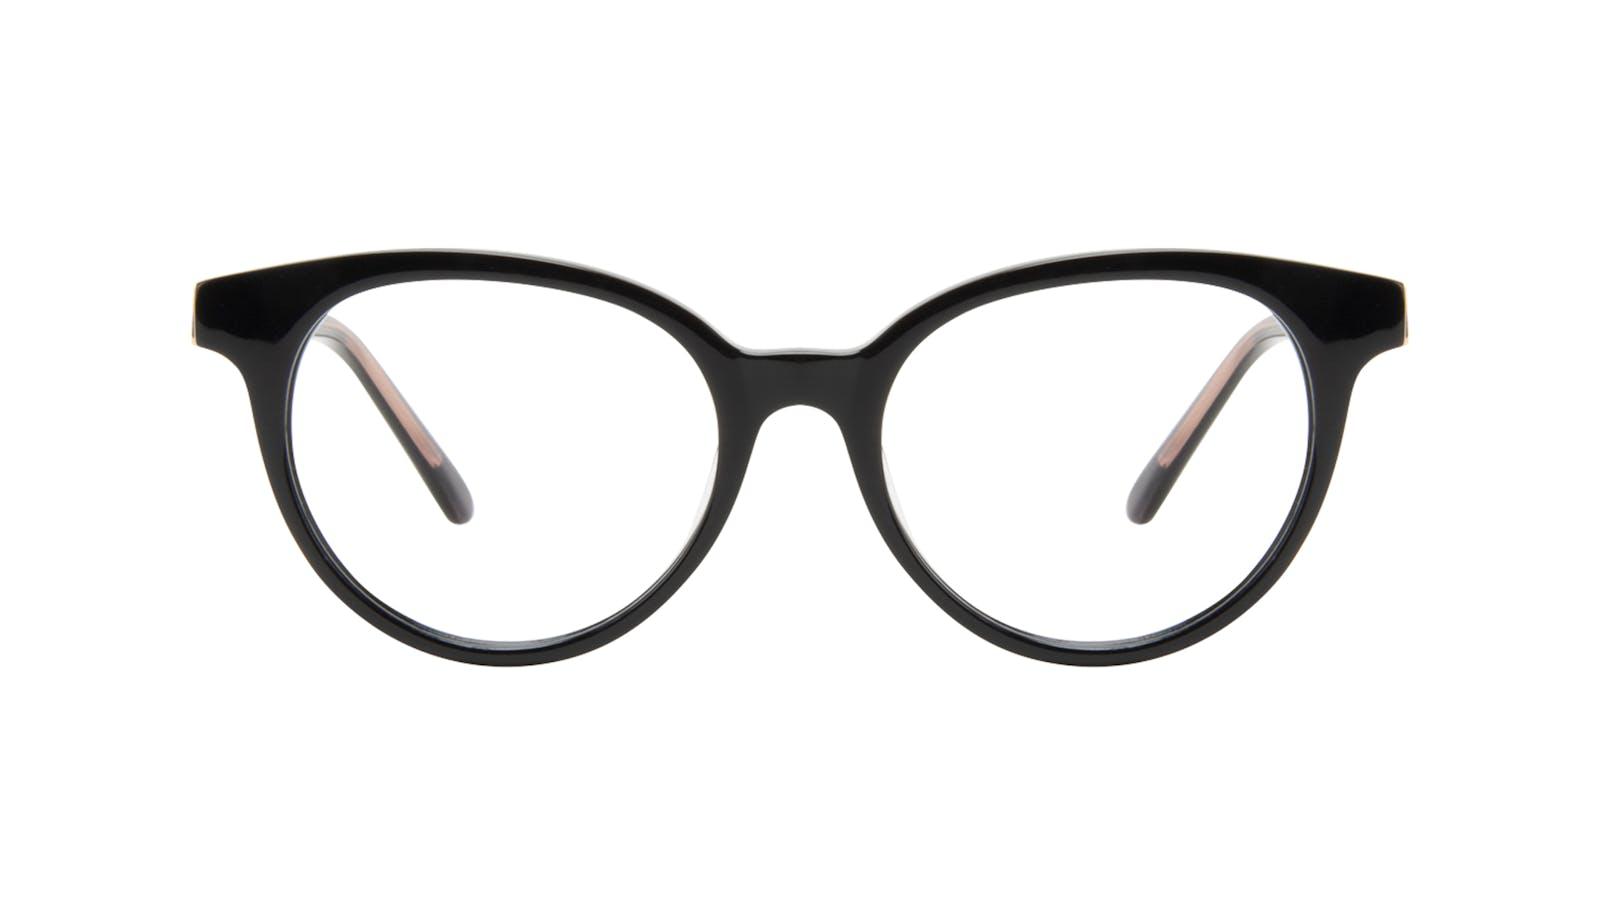 60199164a8 Affordable Fashion Glasses Round Eyeglasses Women Bright Black